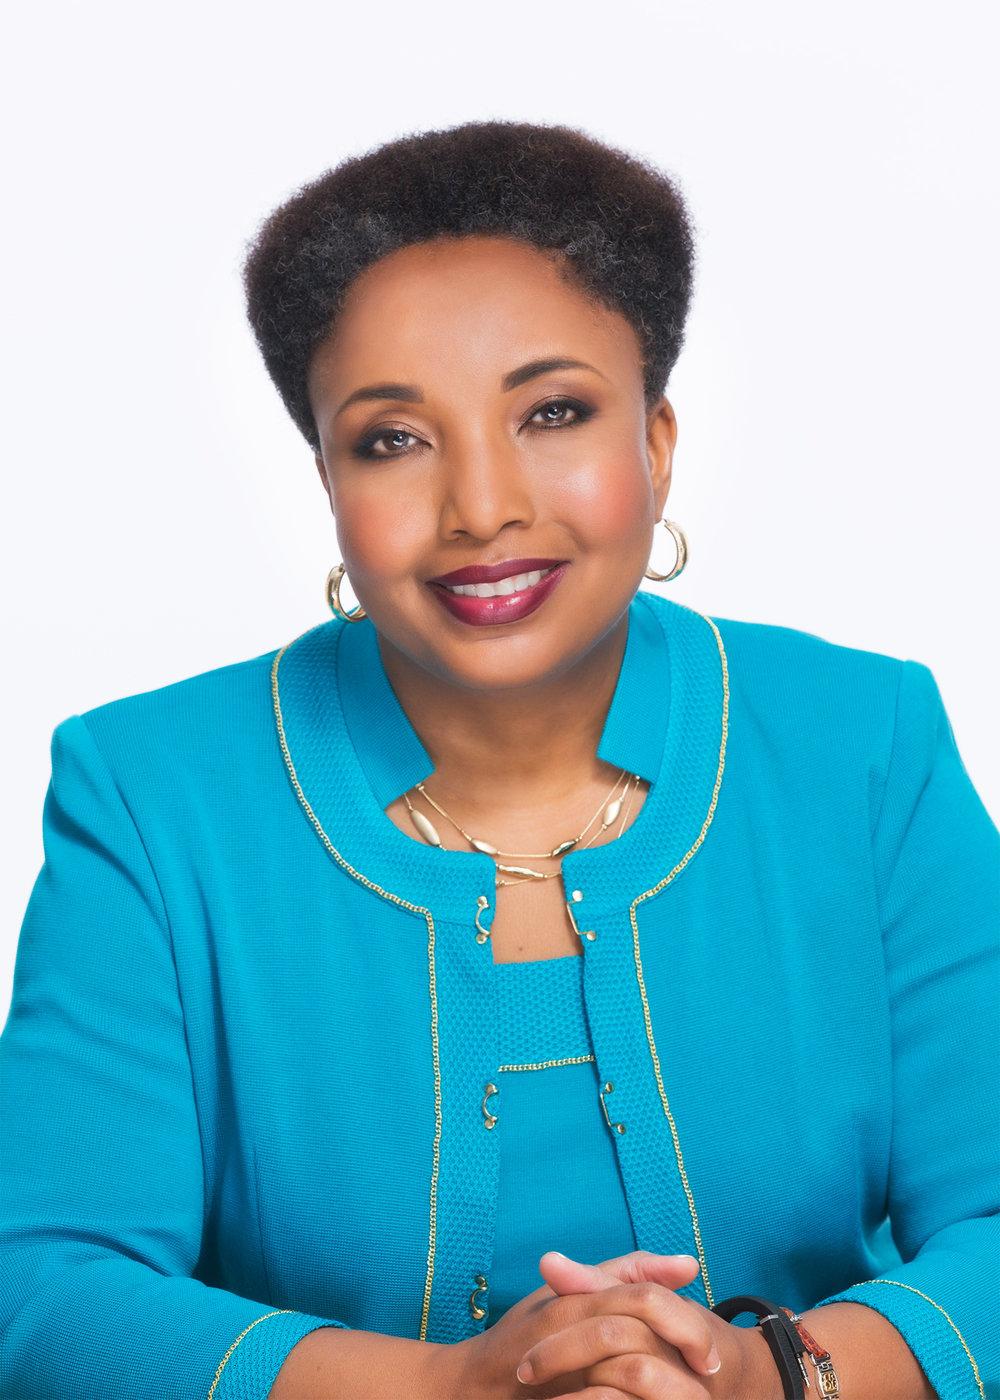 Copy of Dr. Carol M. Swain